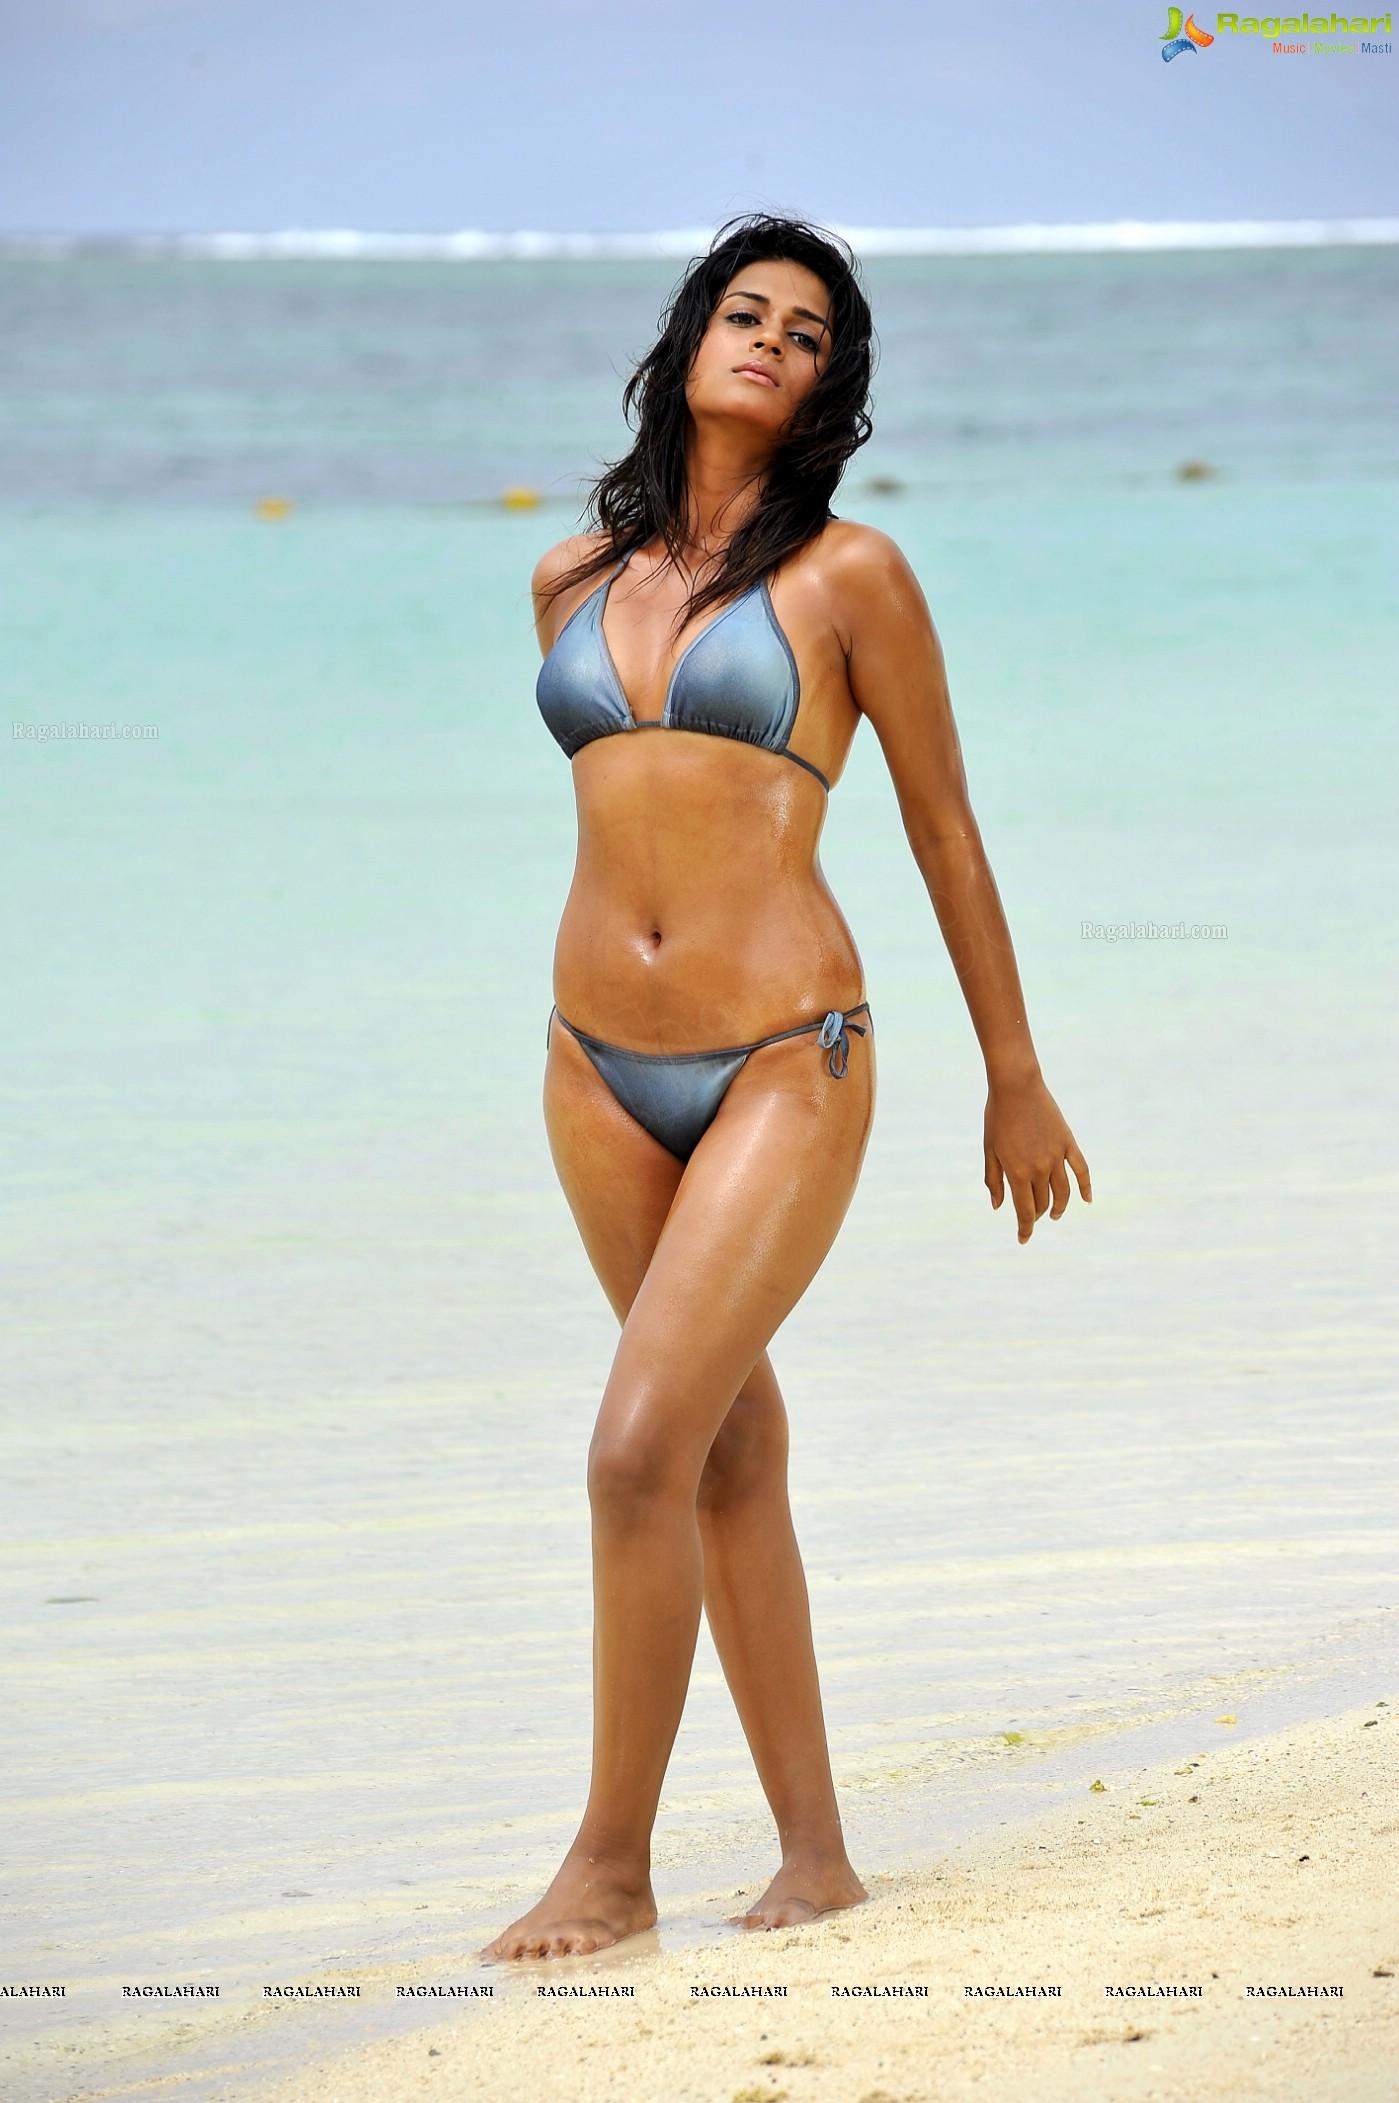 Shraddha Das (Posters) Image 55 | Telugu Actress Hot Photos,Telugu ...